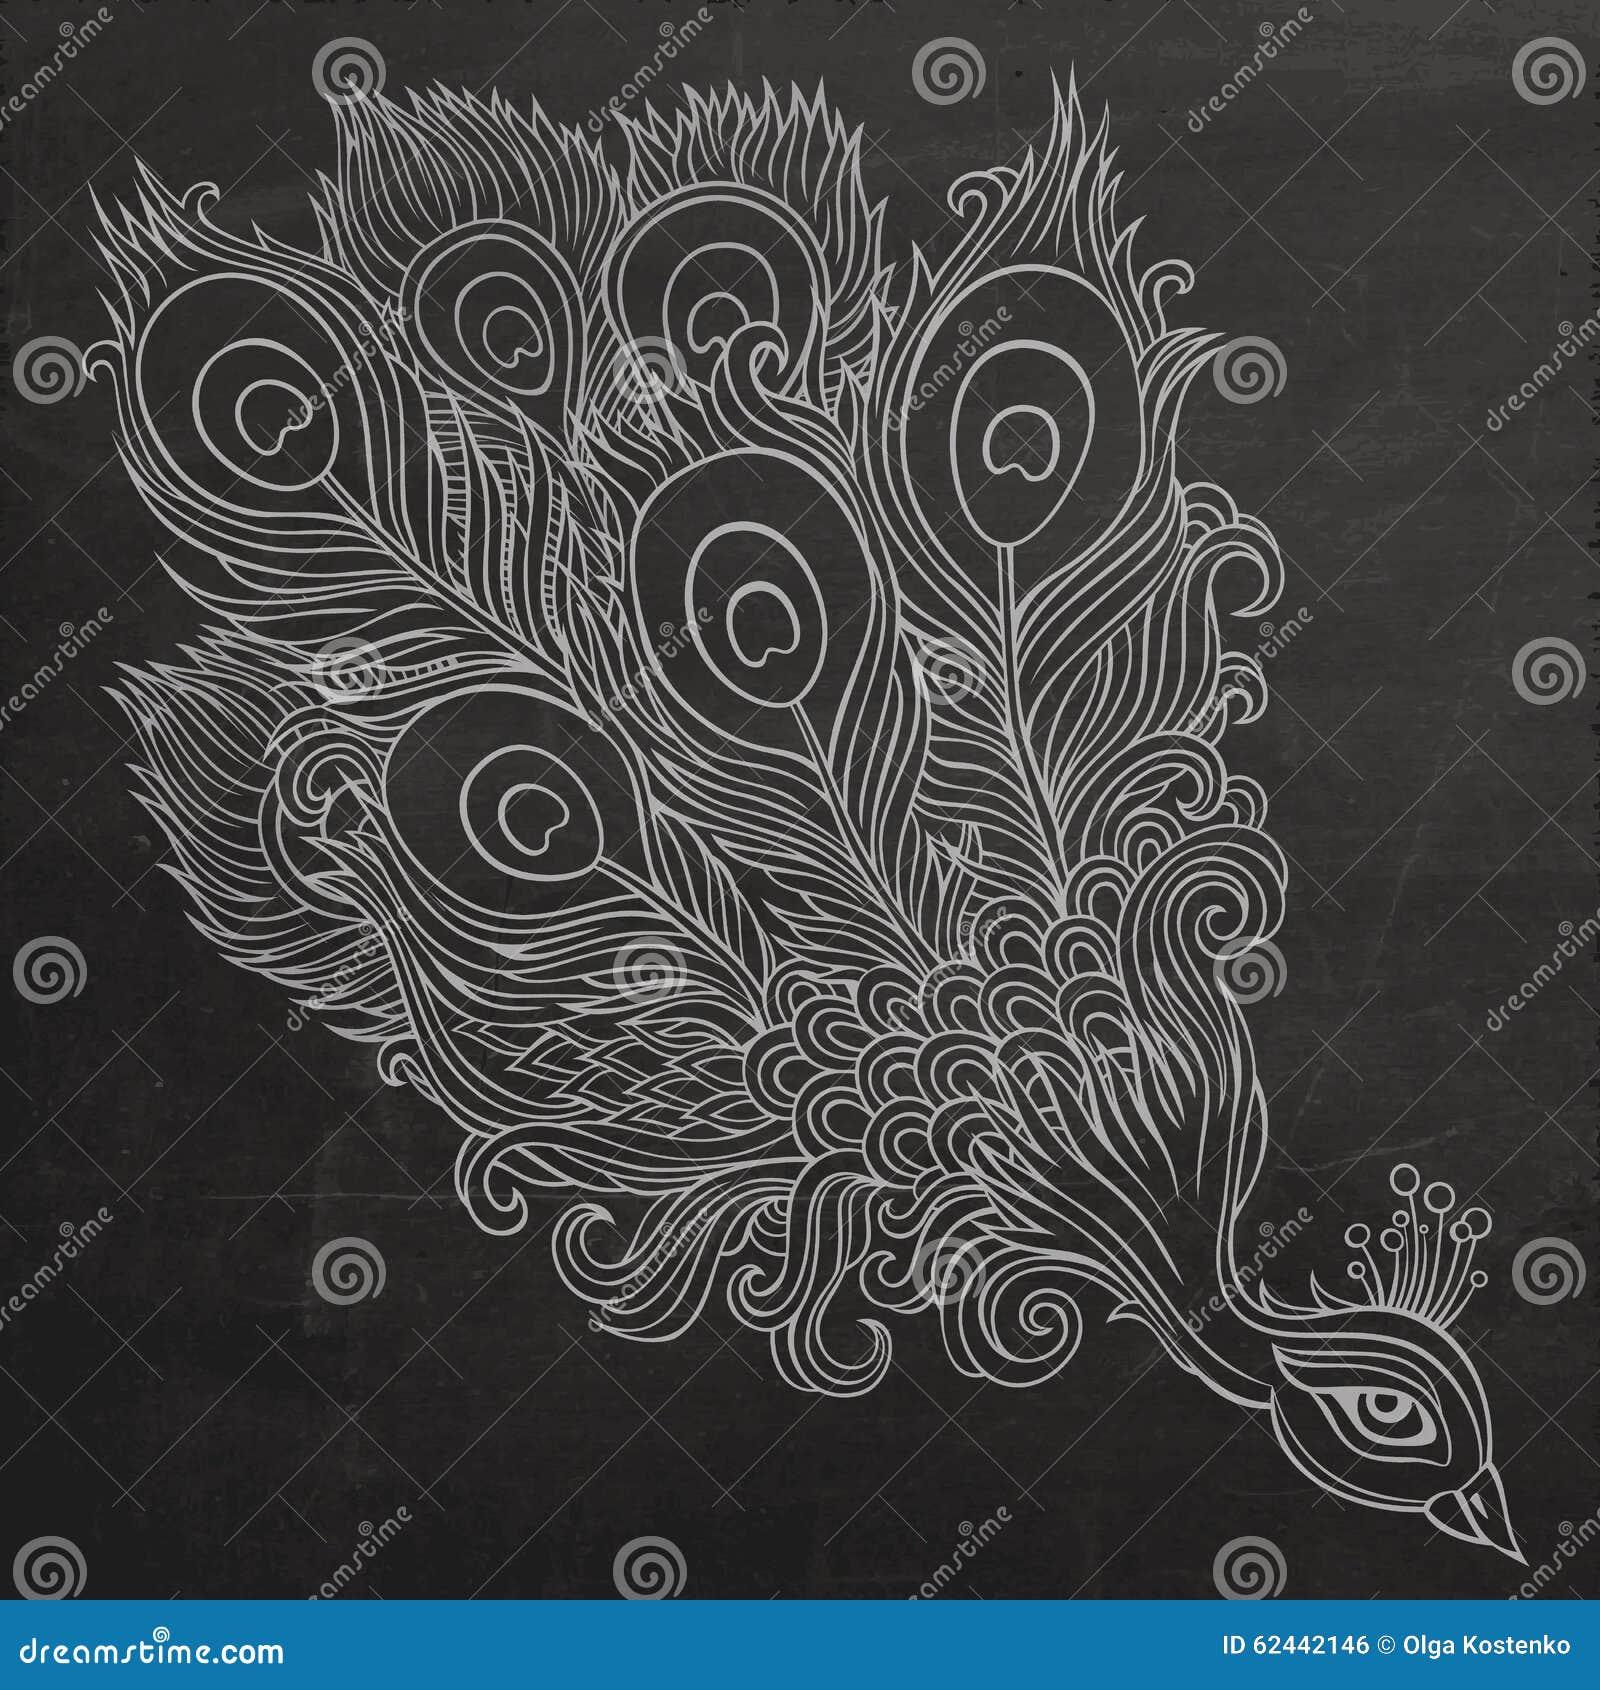 Decorative Ornamental Peacock Chalkboard Stock Vector